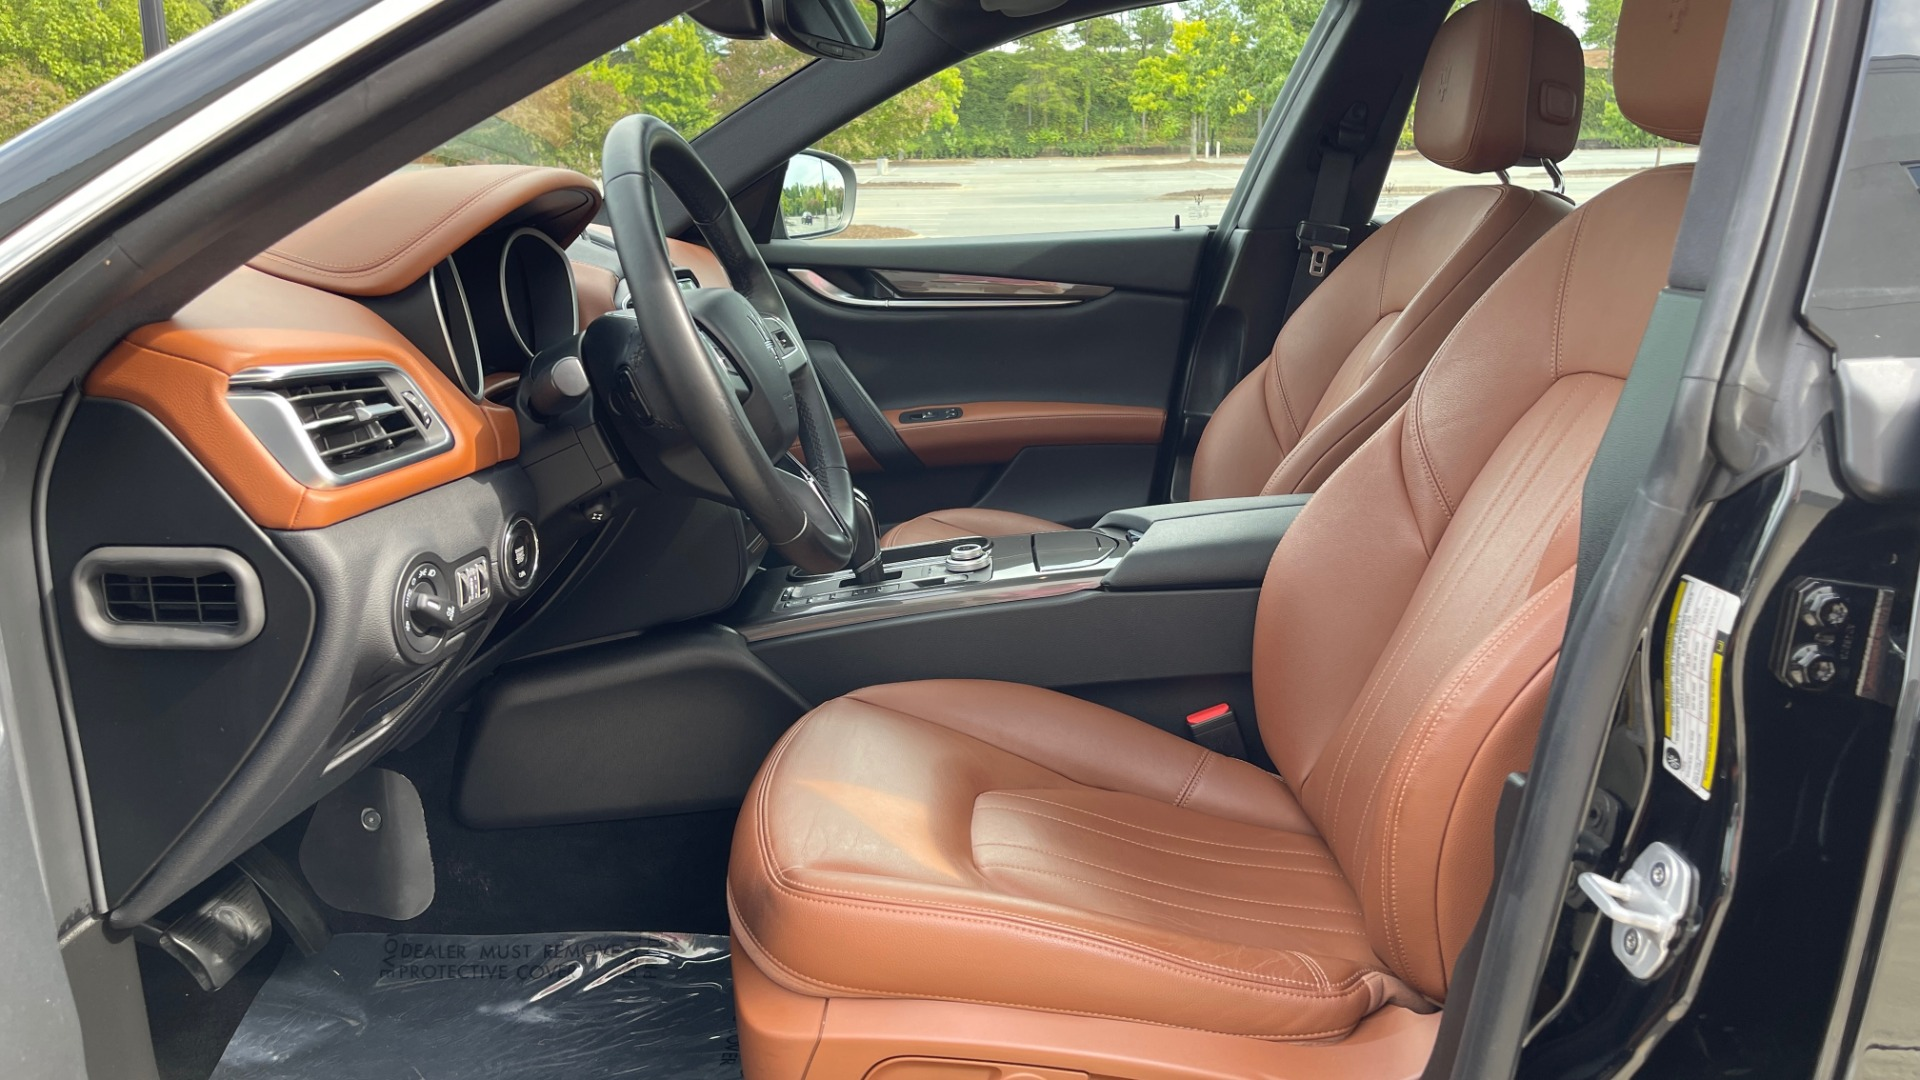 Used 2018 Maserati GHIBLI 3.0L SEDAN / 8-SPD AUTO / NAV / SUNROOF / REARVIEW for sale $42,995 at Formula Imports in Charlotte NC 28227 30